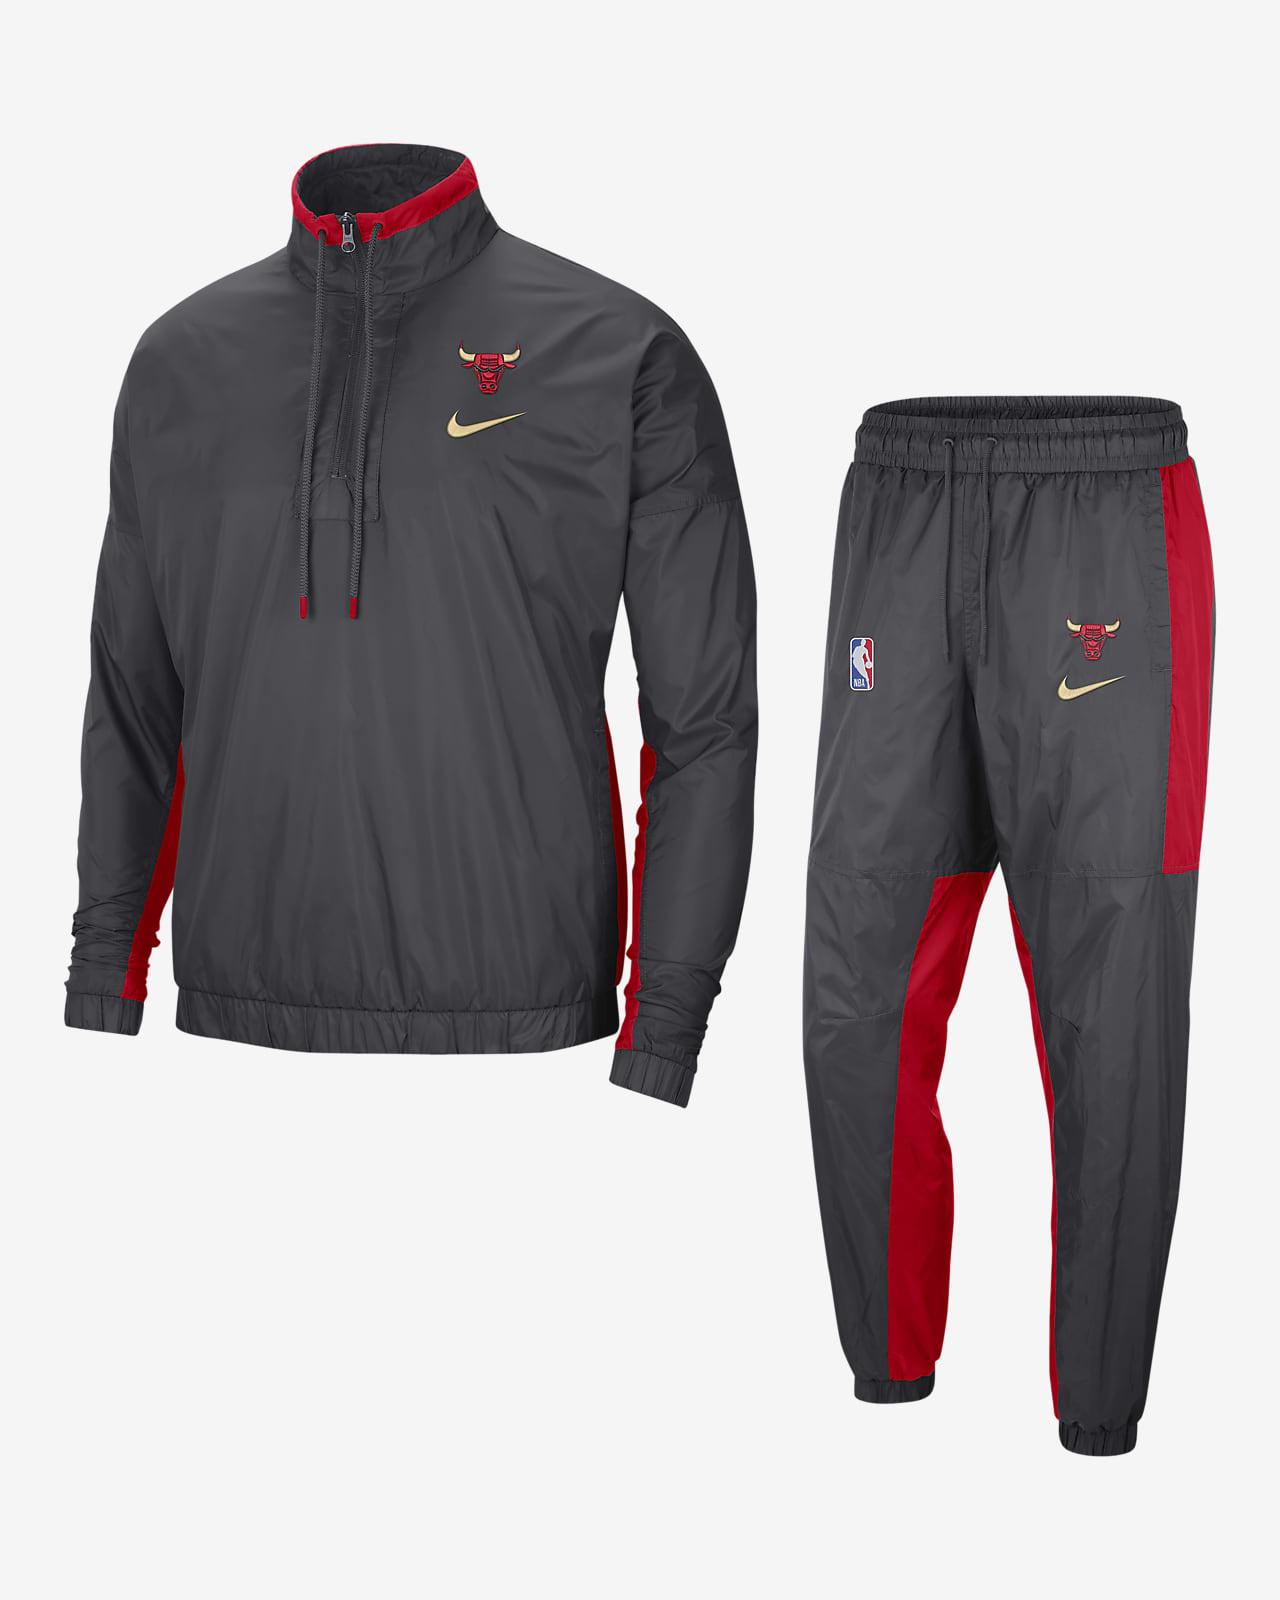 Chicago Bulls City Edition Courtside Men's Nike NBA Tracksuit